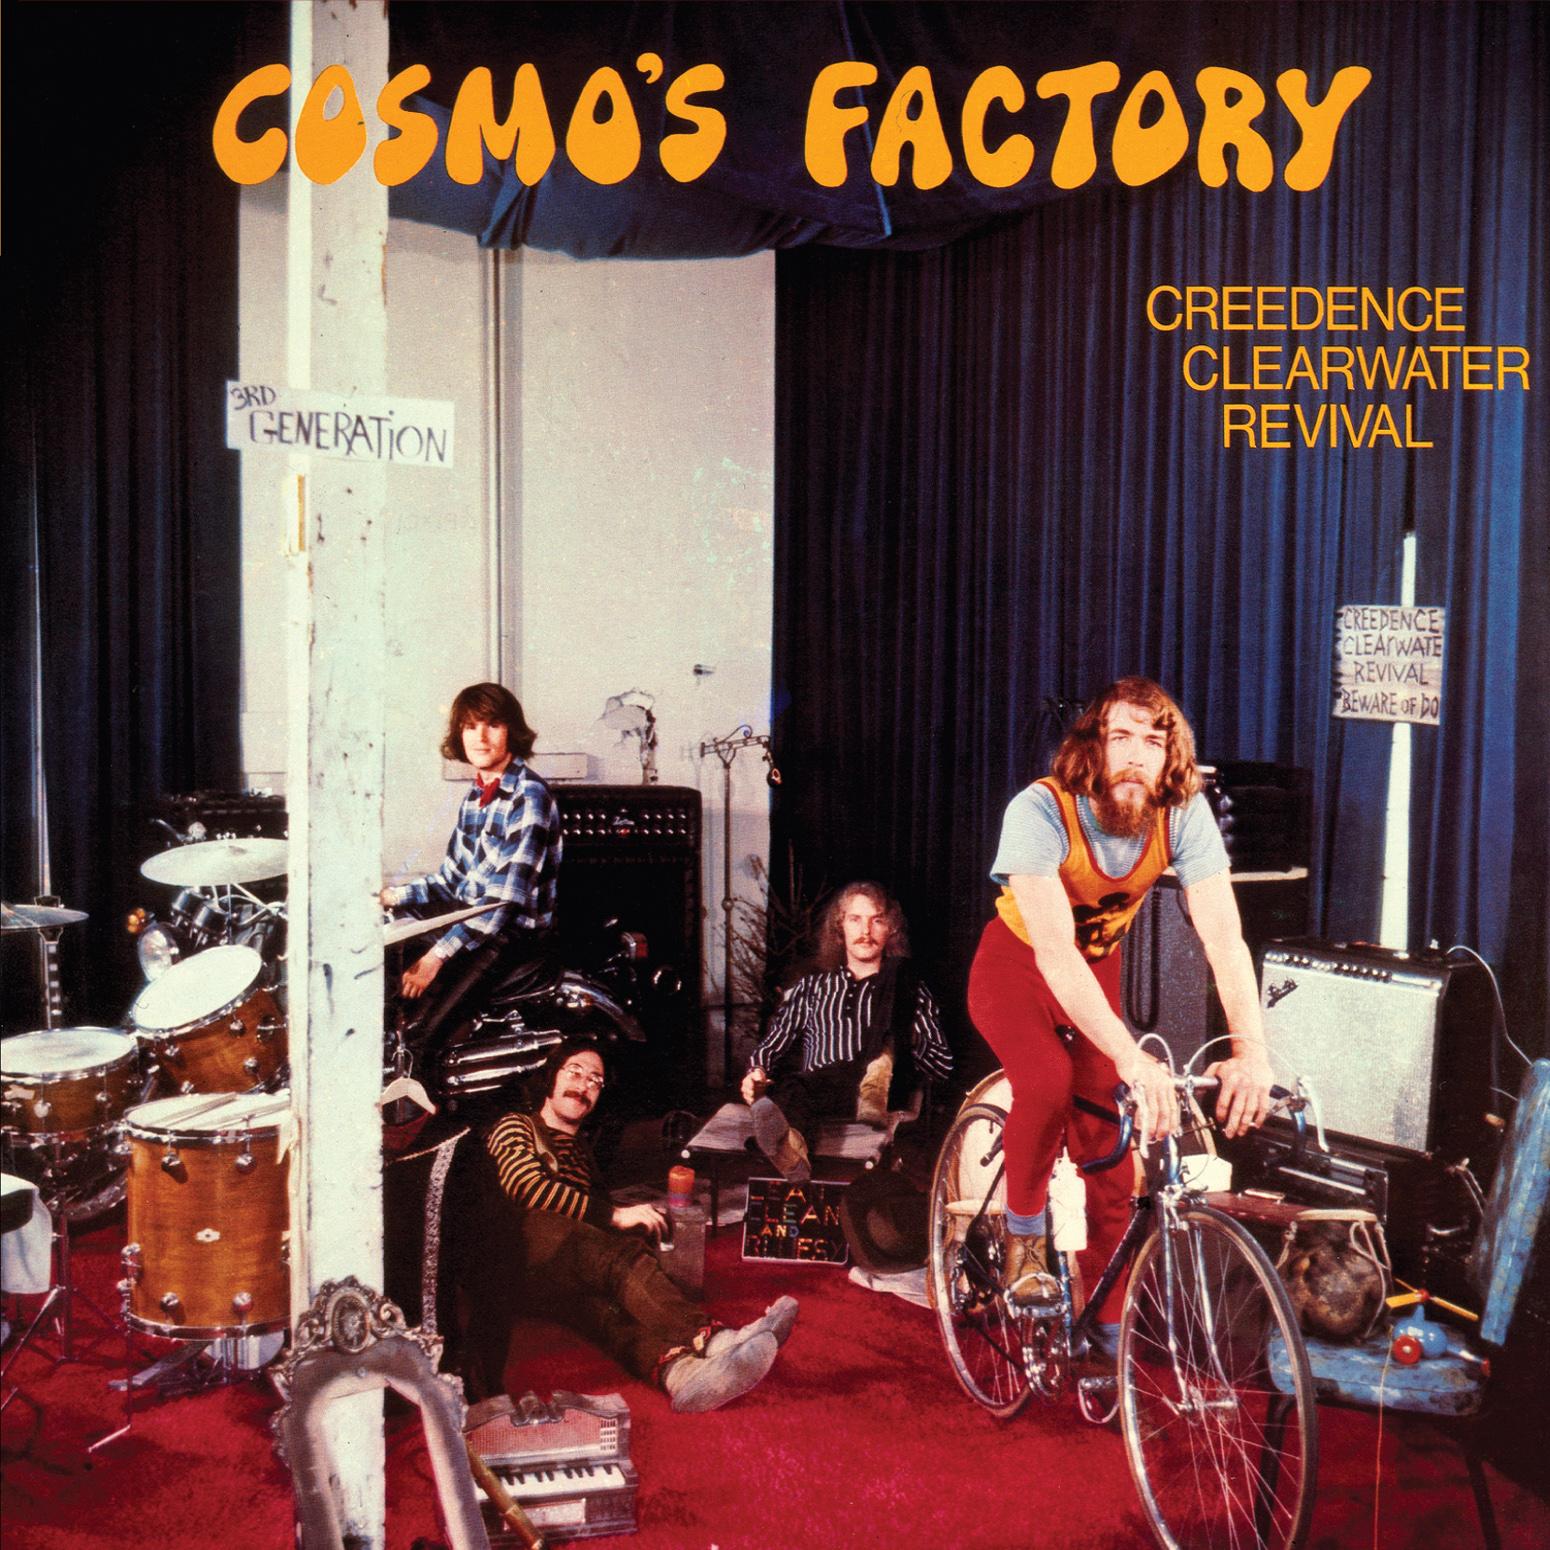 cosmos-factory-40th-anniversary-cover-art-hi.jpg